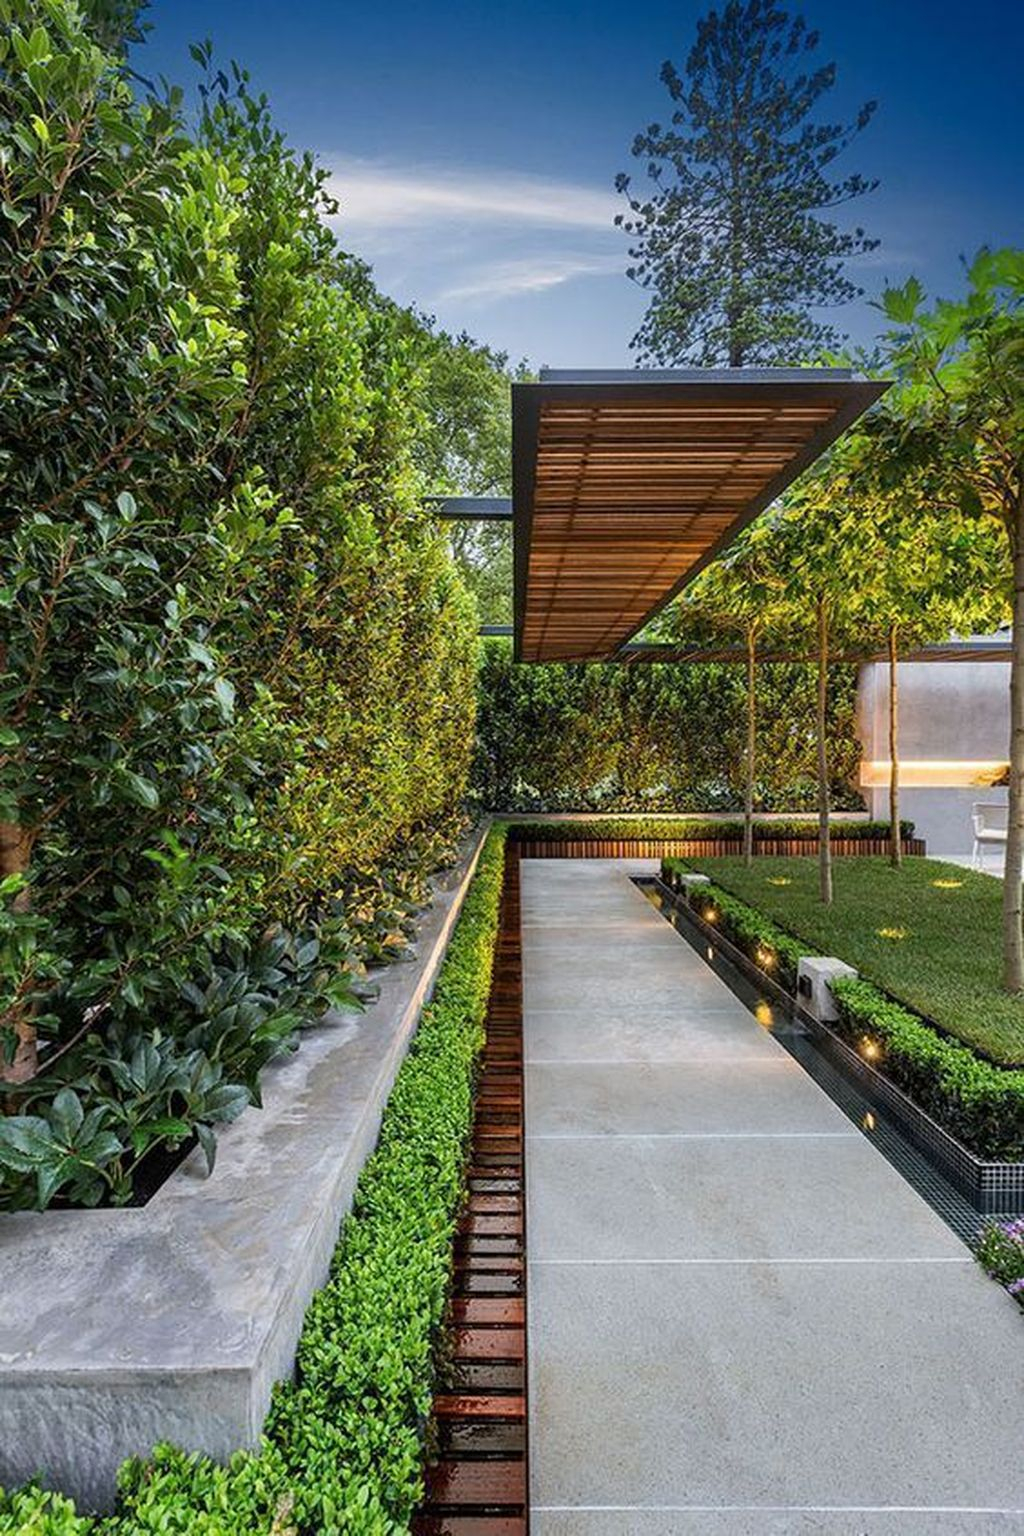 Inspiring Minimalist Frontyard Design Ideas To Try Asap 15